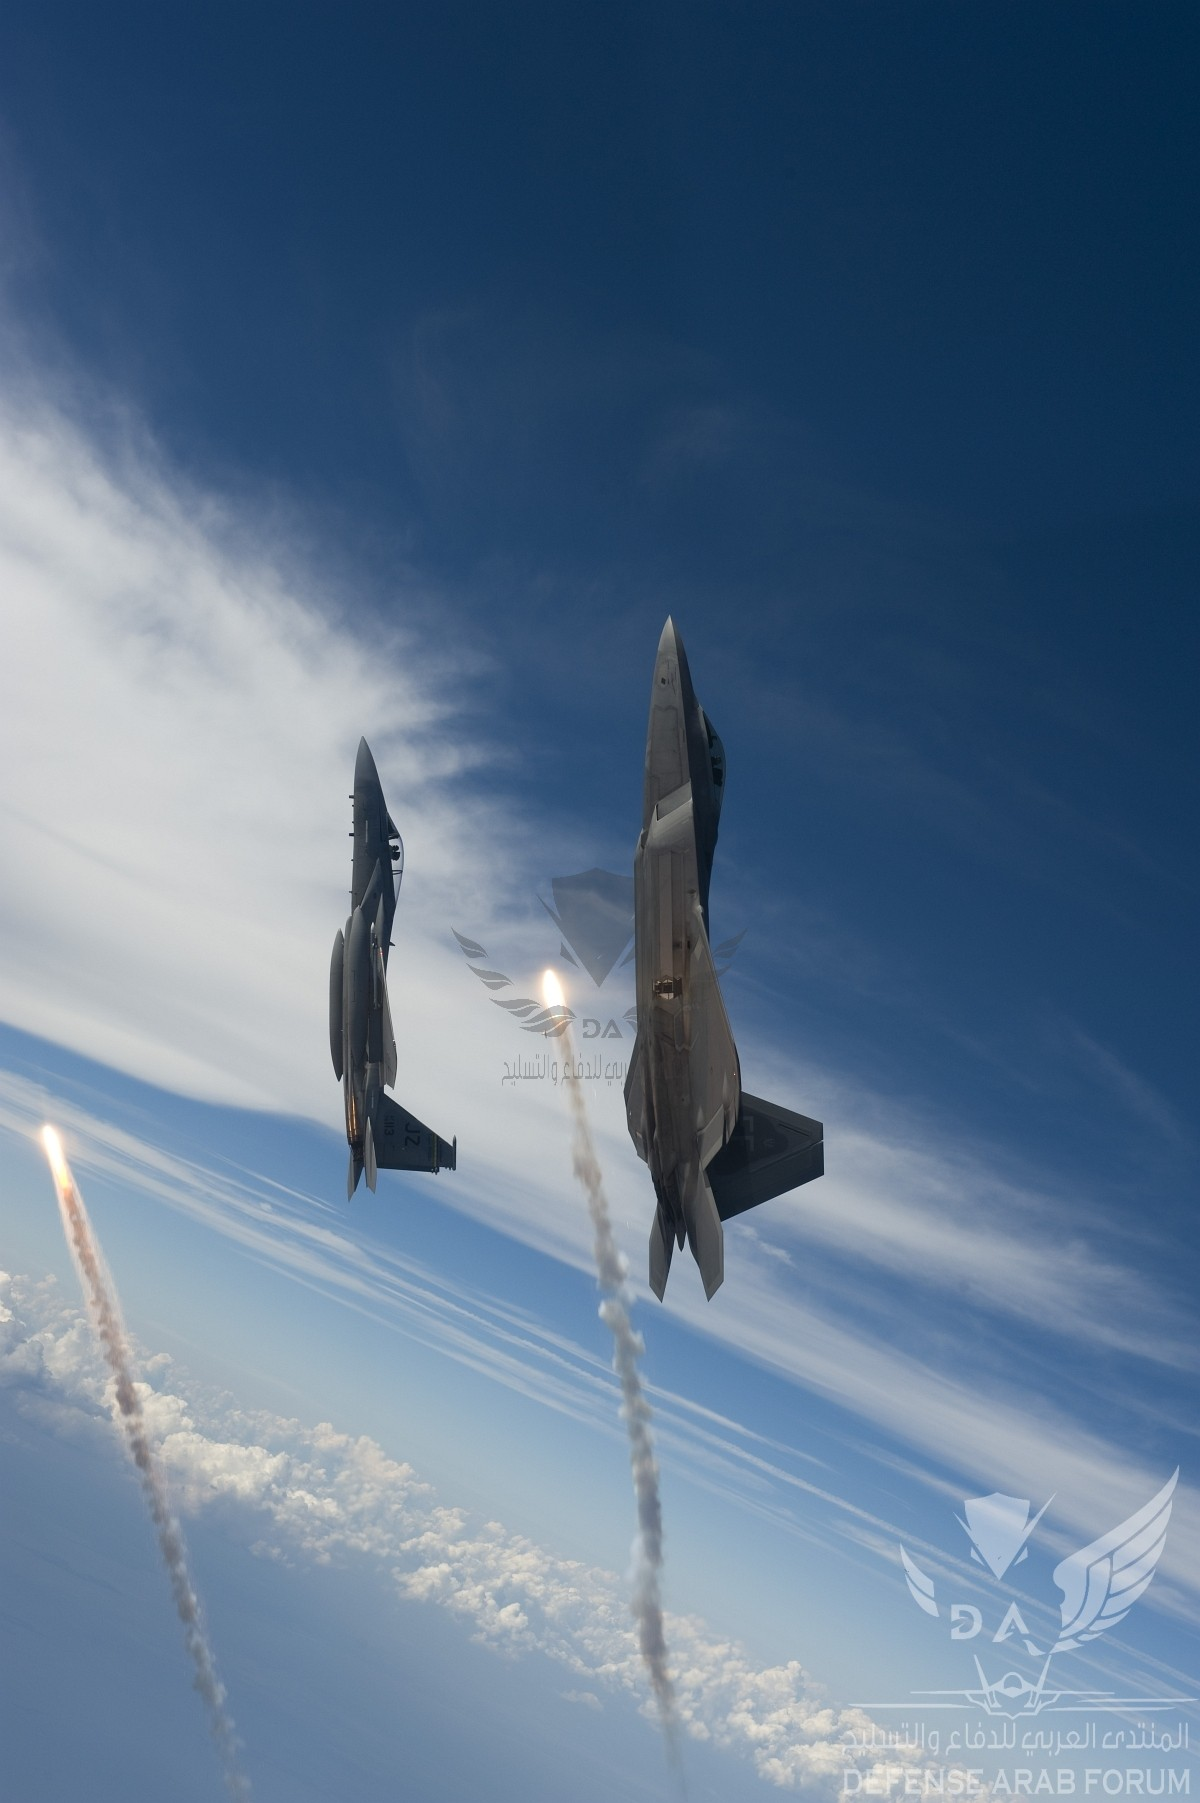 gpw-20060914-UnitedStatesAirForce-080827-F-4177H-103-F-22A-Raptor-and-F-15-Eagle-fire-flares-G...jpg